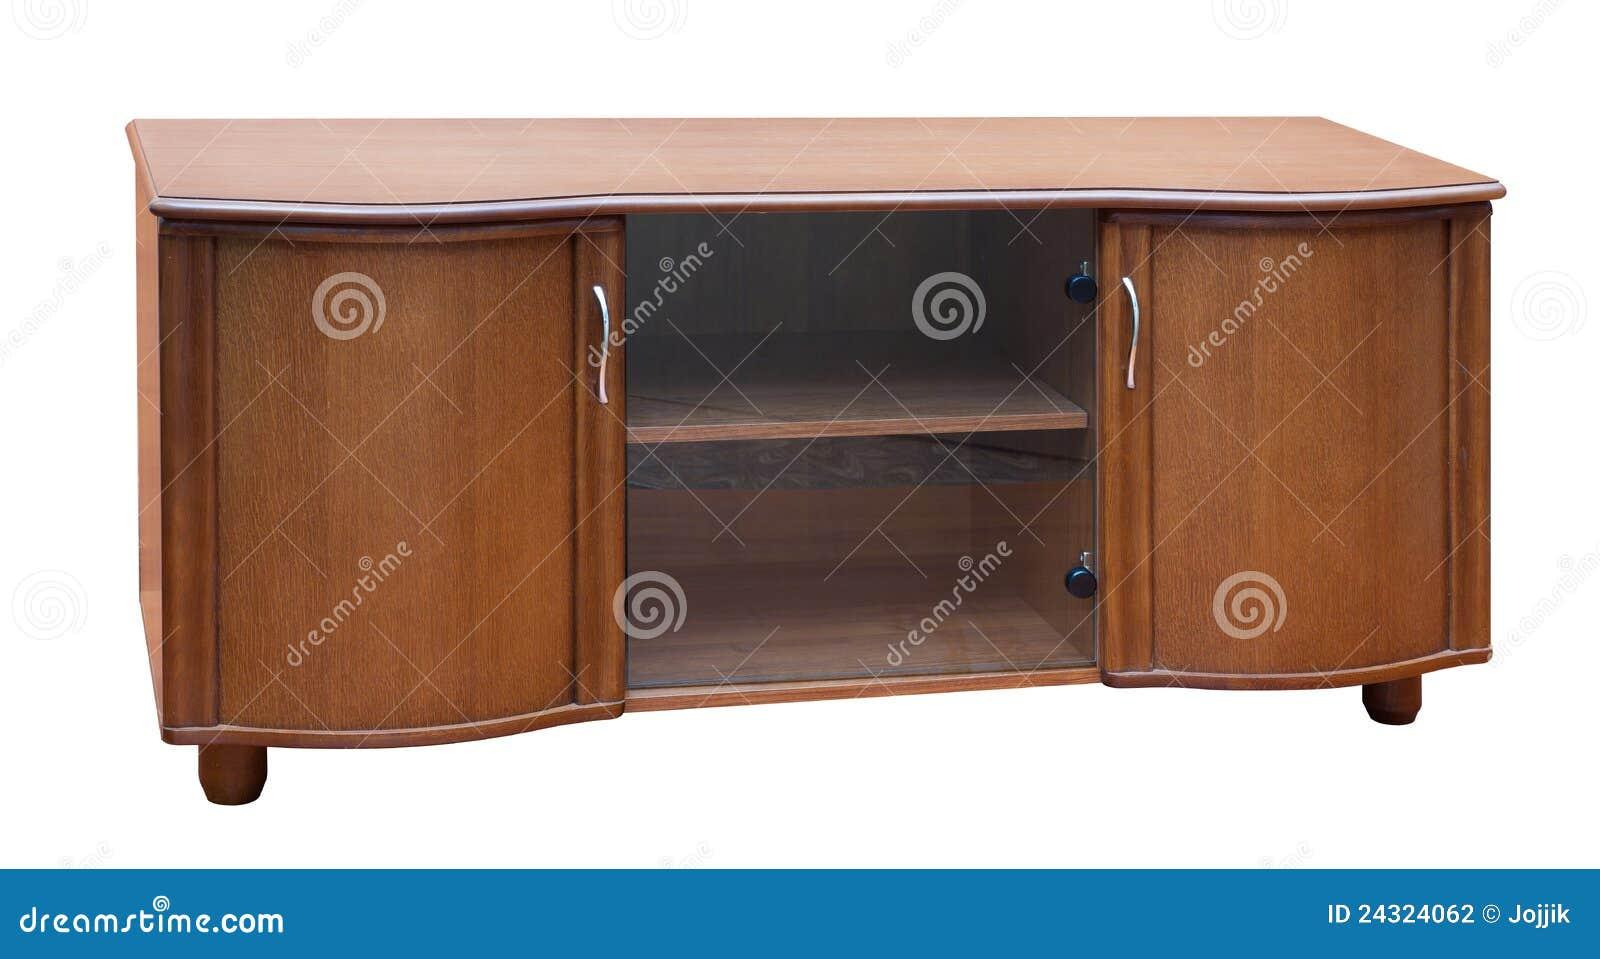 Wooden old stile bureau stock photography image 24324062 for Bureau stock